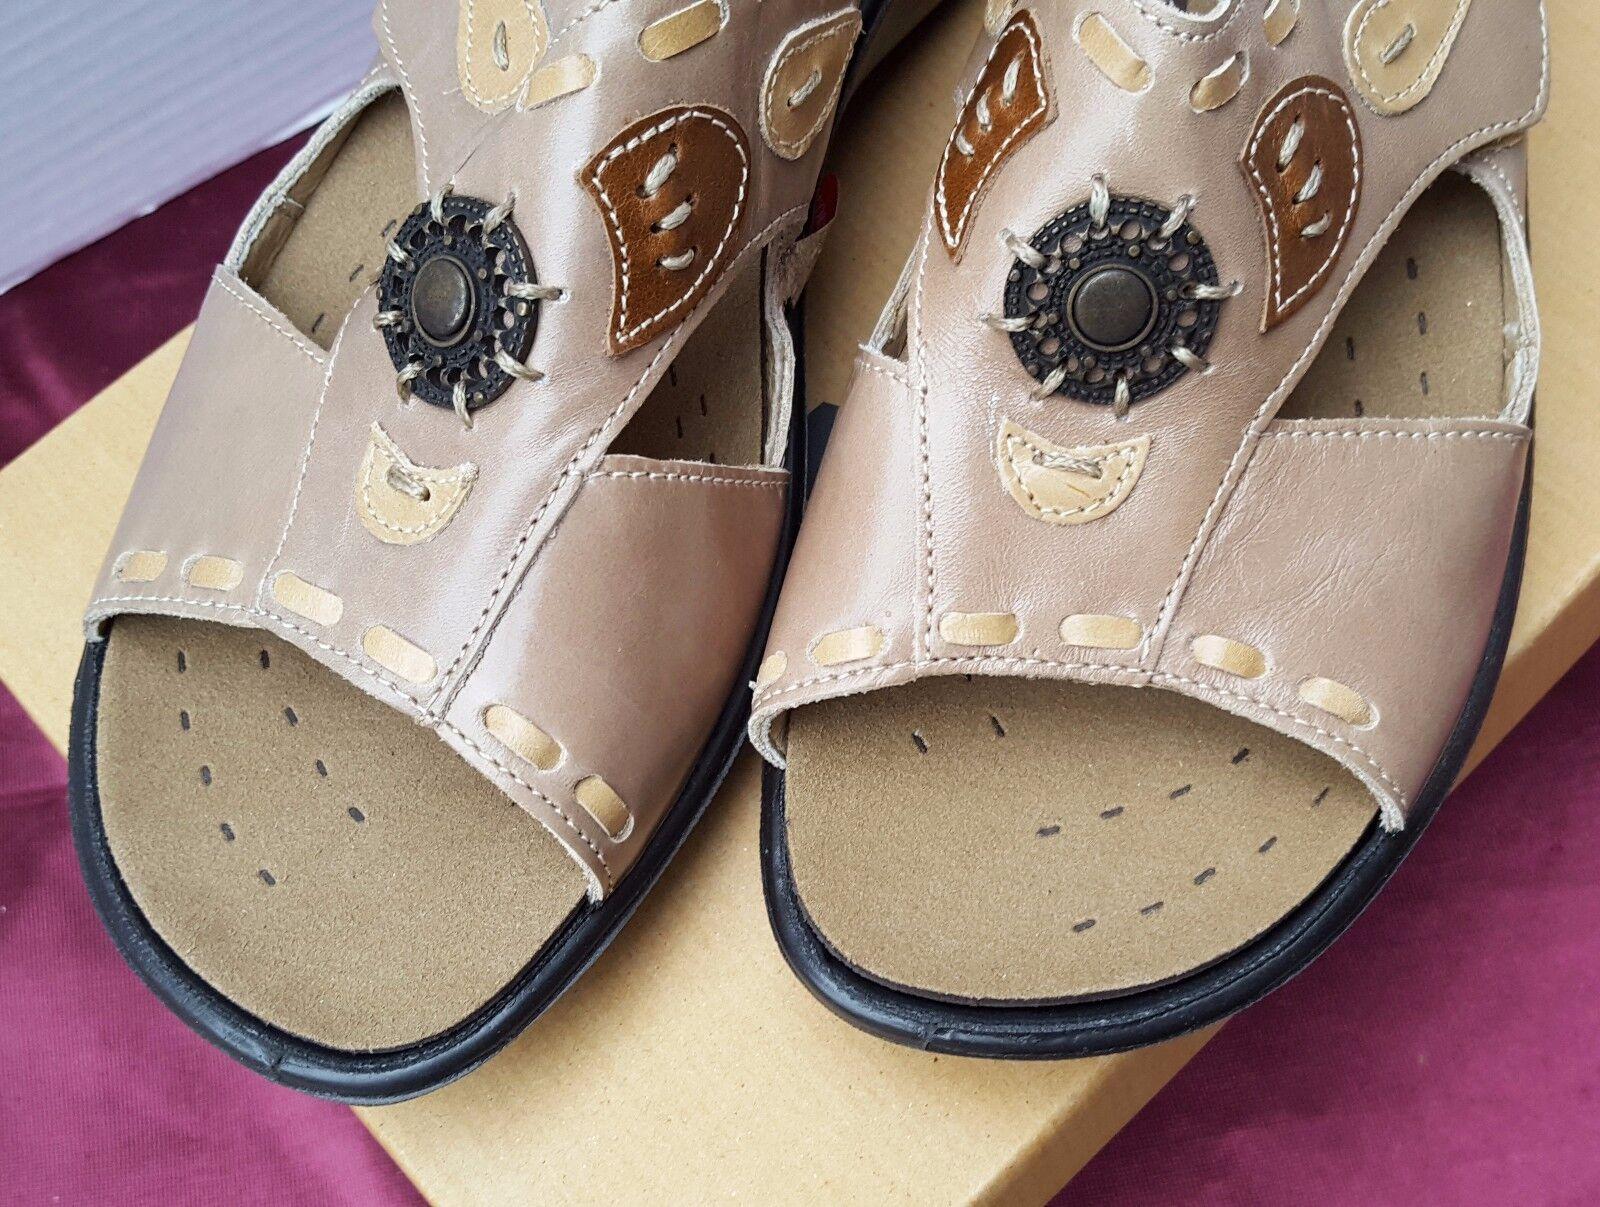 New Donna Romika Wellness Shock Pelle Sandals Adjustable Slip On Shock Wellness Soles 40 12ba38